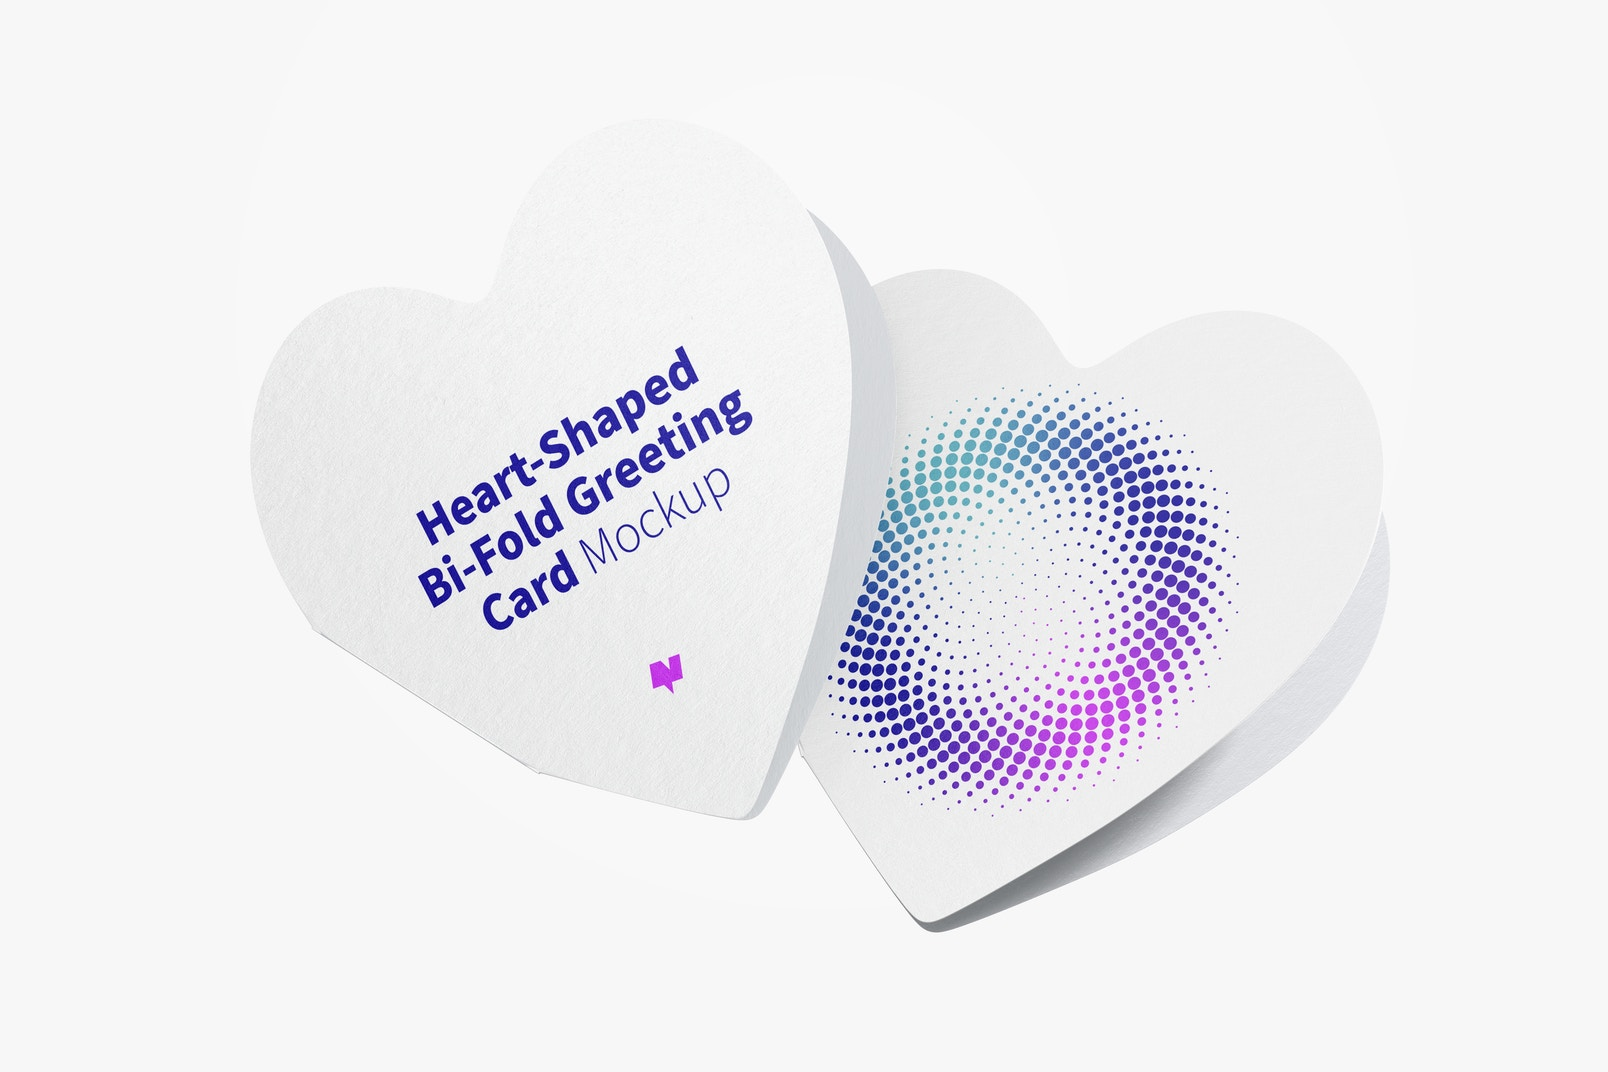 Heart-Shaped Bi-Fold Greeting Cards Mockup, Closed